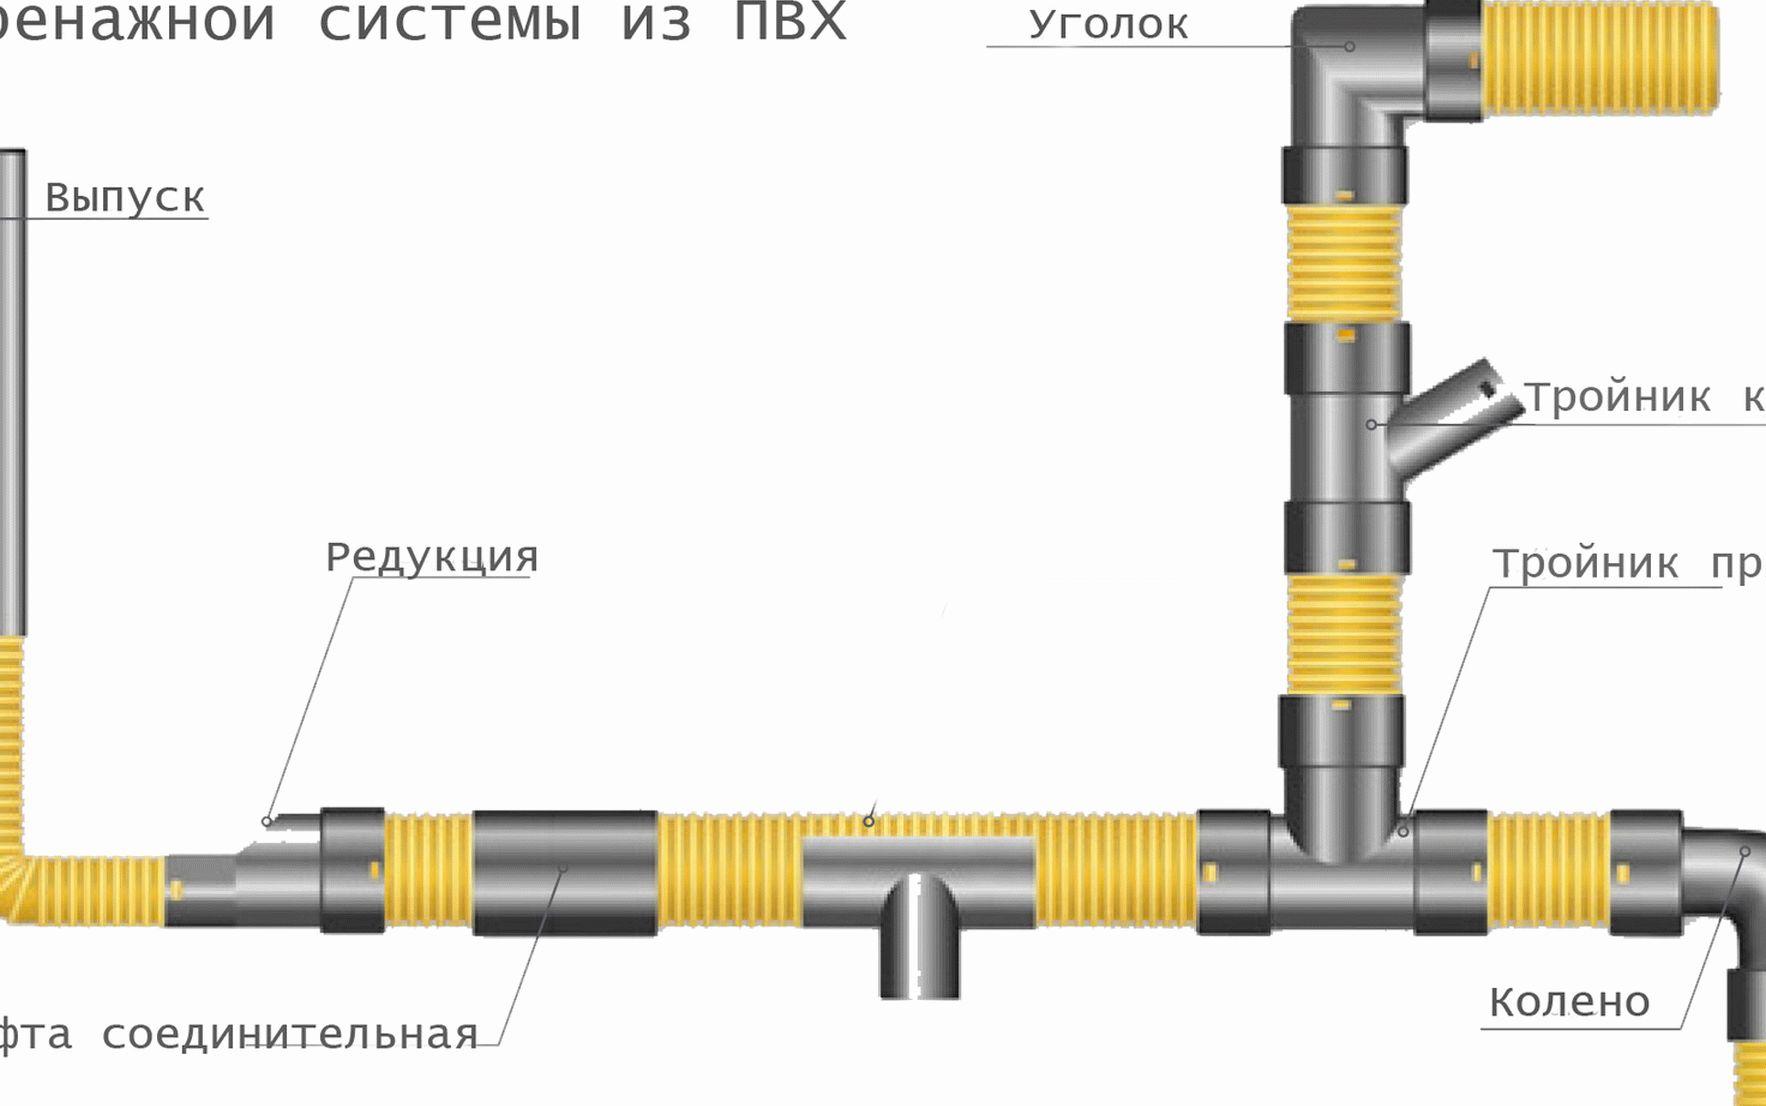 Пример монтажа трубы из ПВХ